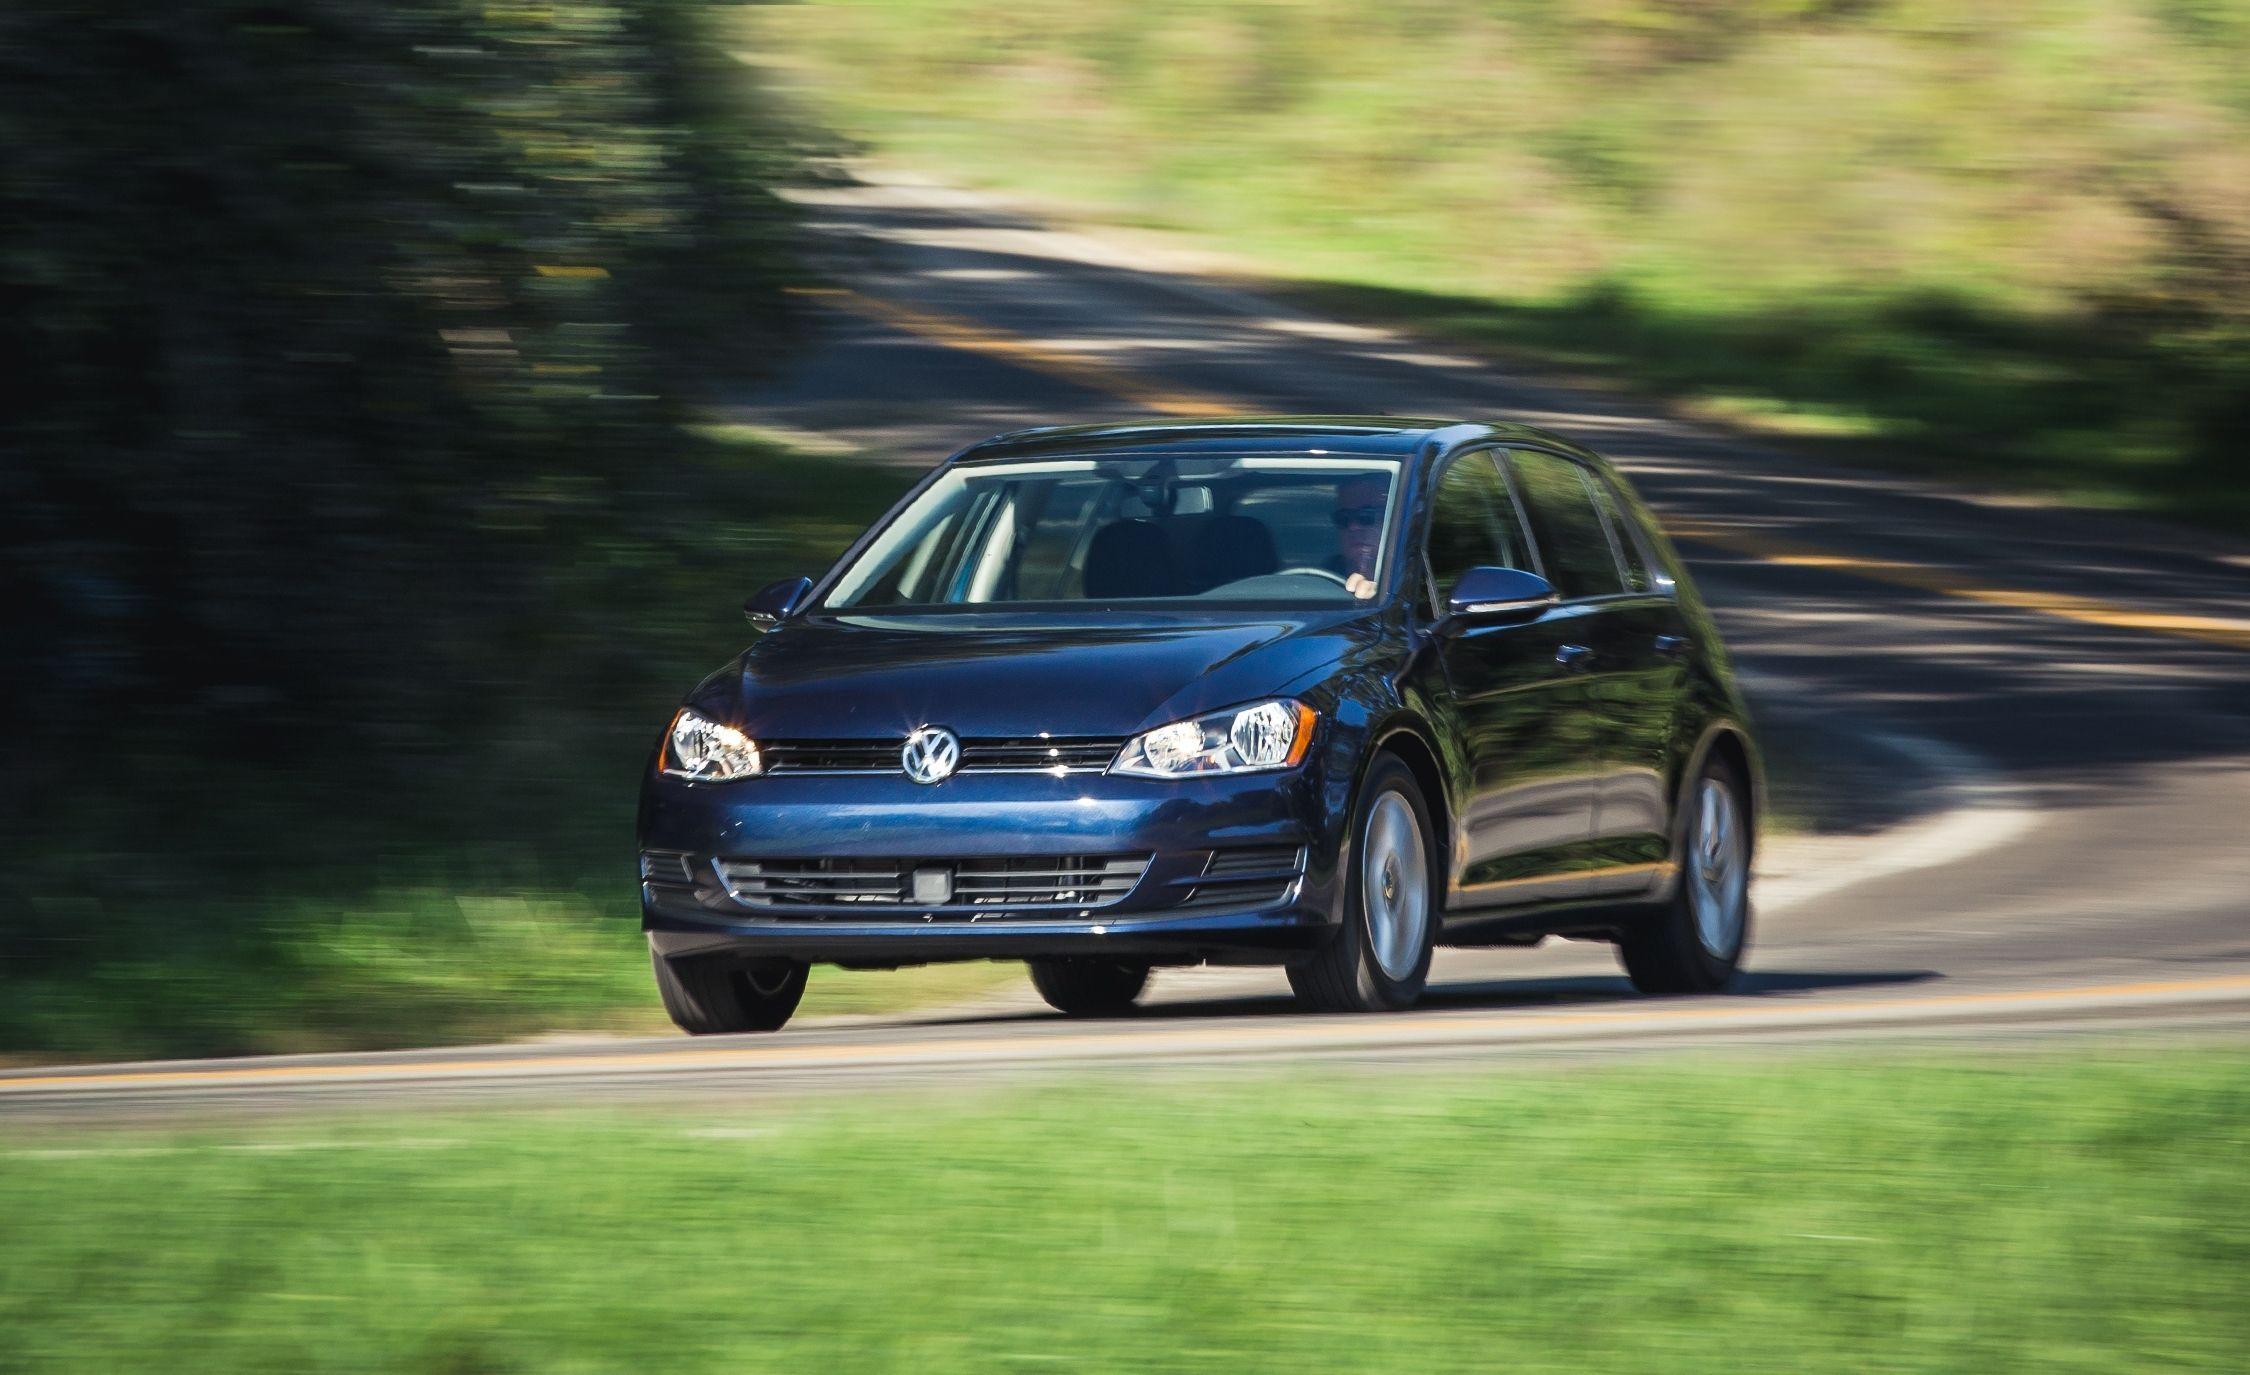 2017 Volkswagen Golf 1.8T TSI Automatic